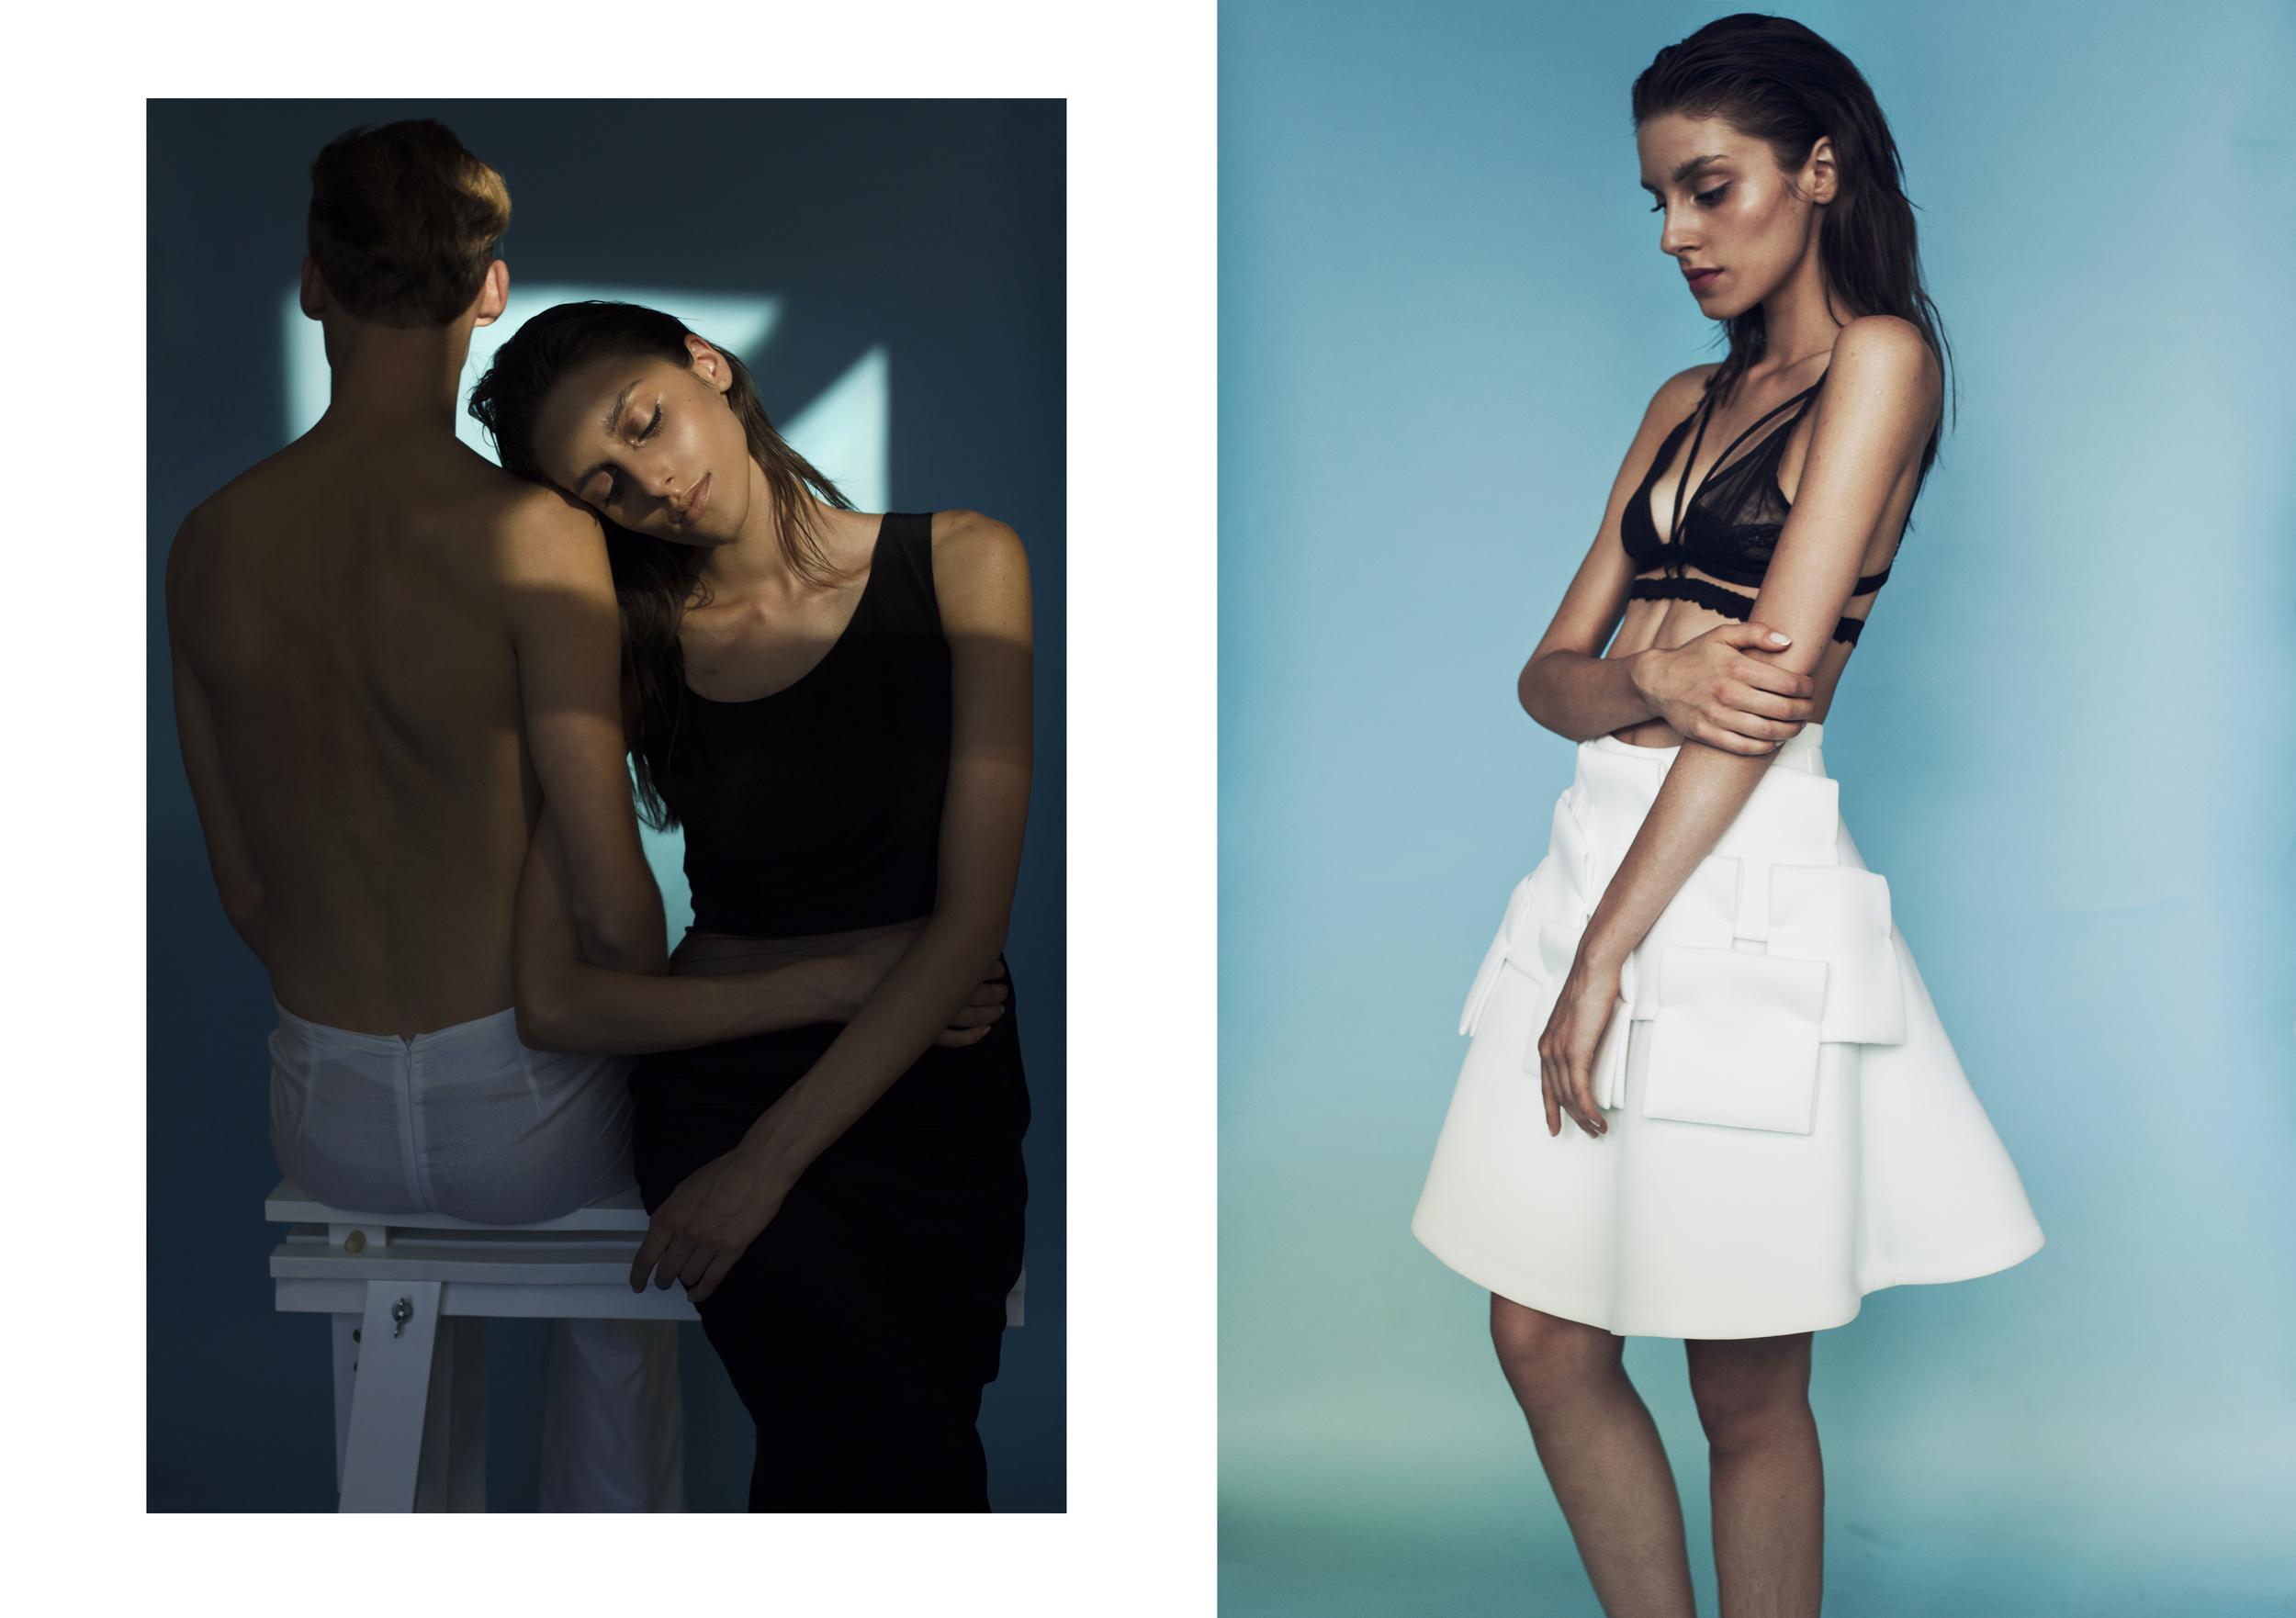 White Pants: Agnieszka Kopek / Dress: Maya Baczynska / Black Bra: Agnieszka Kopek / White Skirt: Maya Baczynska